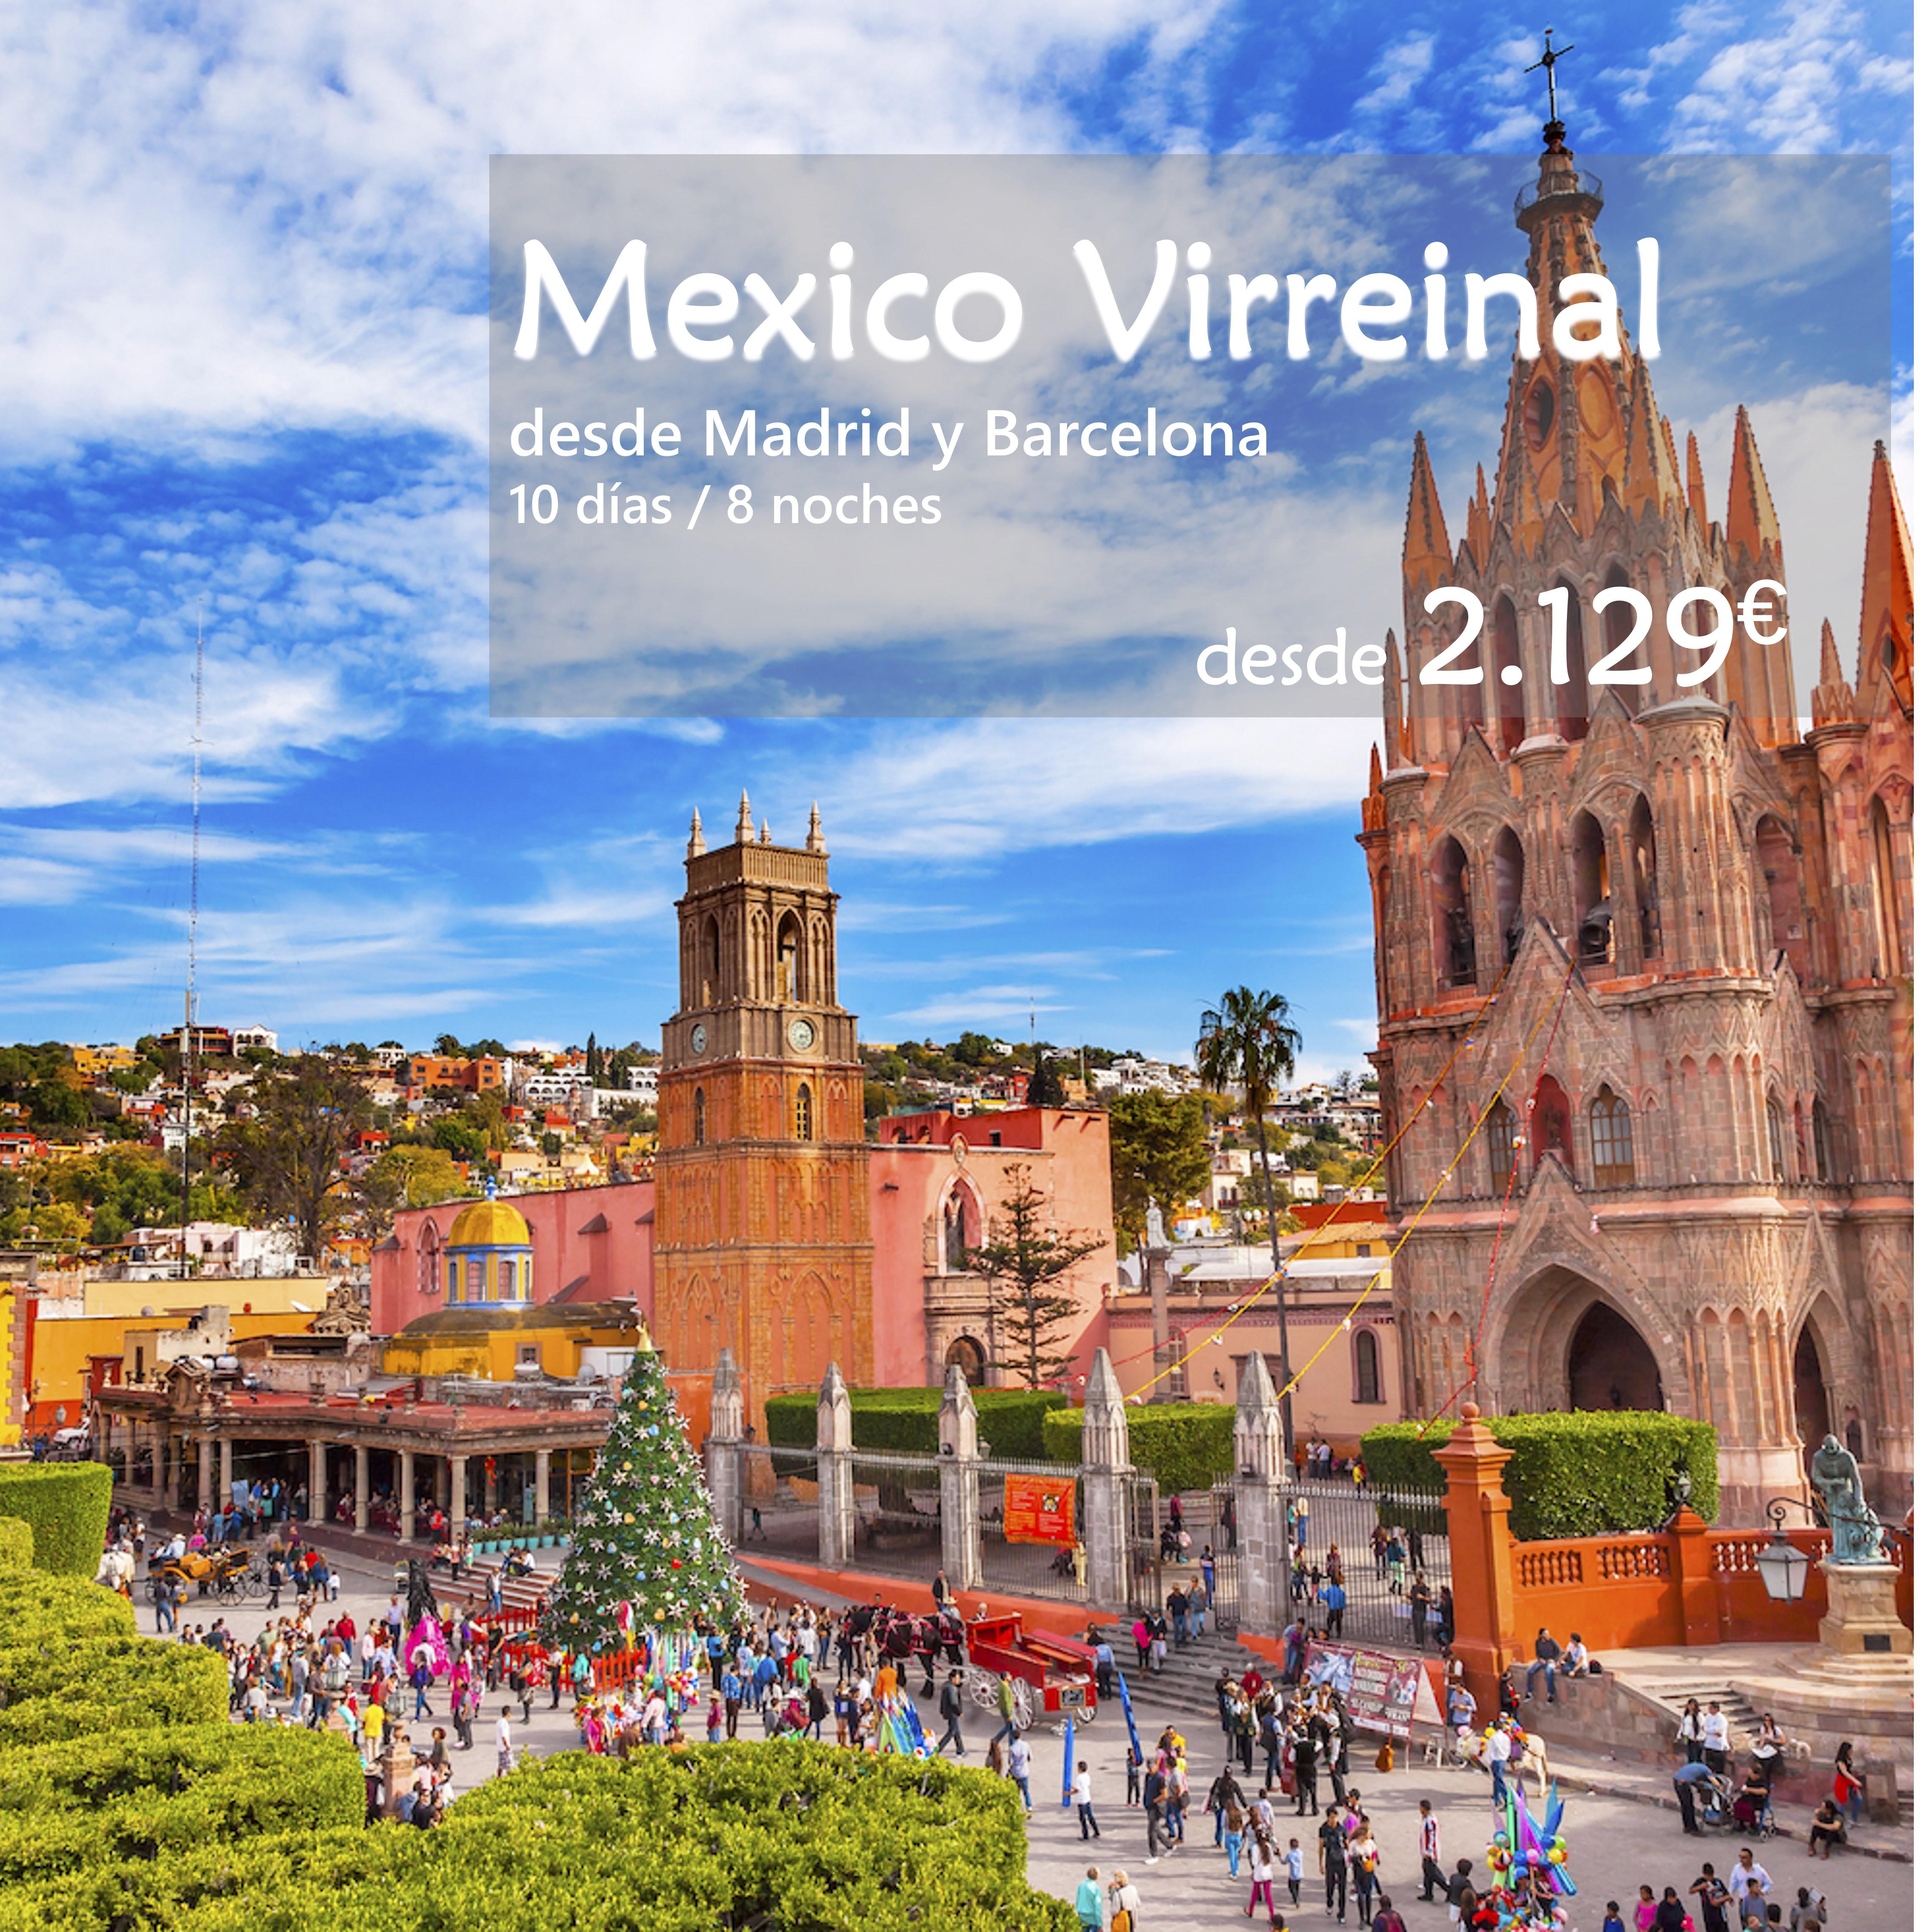 Mexico Virreinal